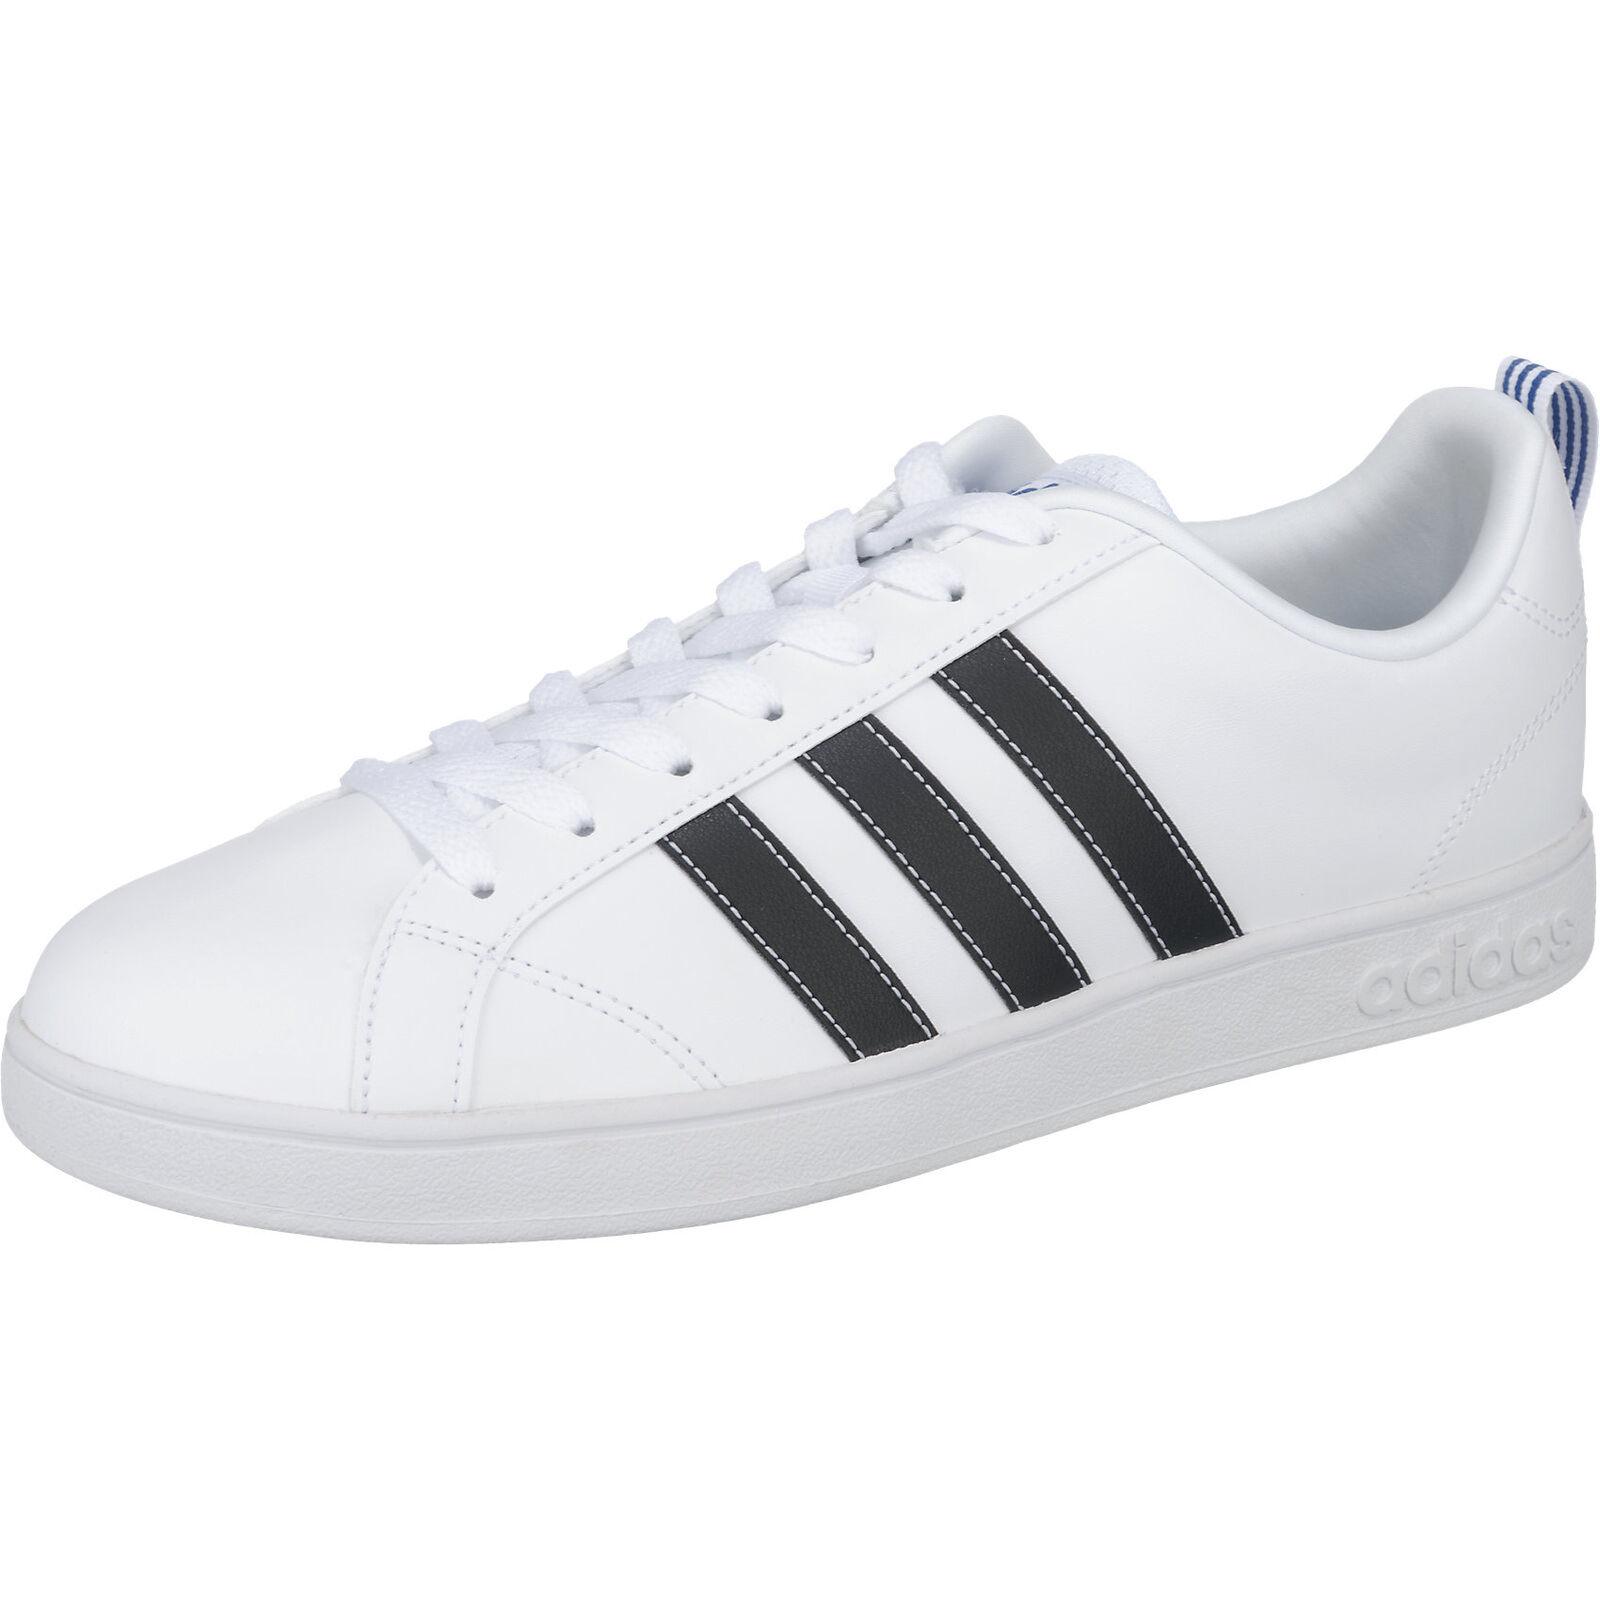 Neu adidas NEO Vs Advantage Sneakers weiß-kombi 5766794